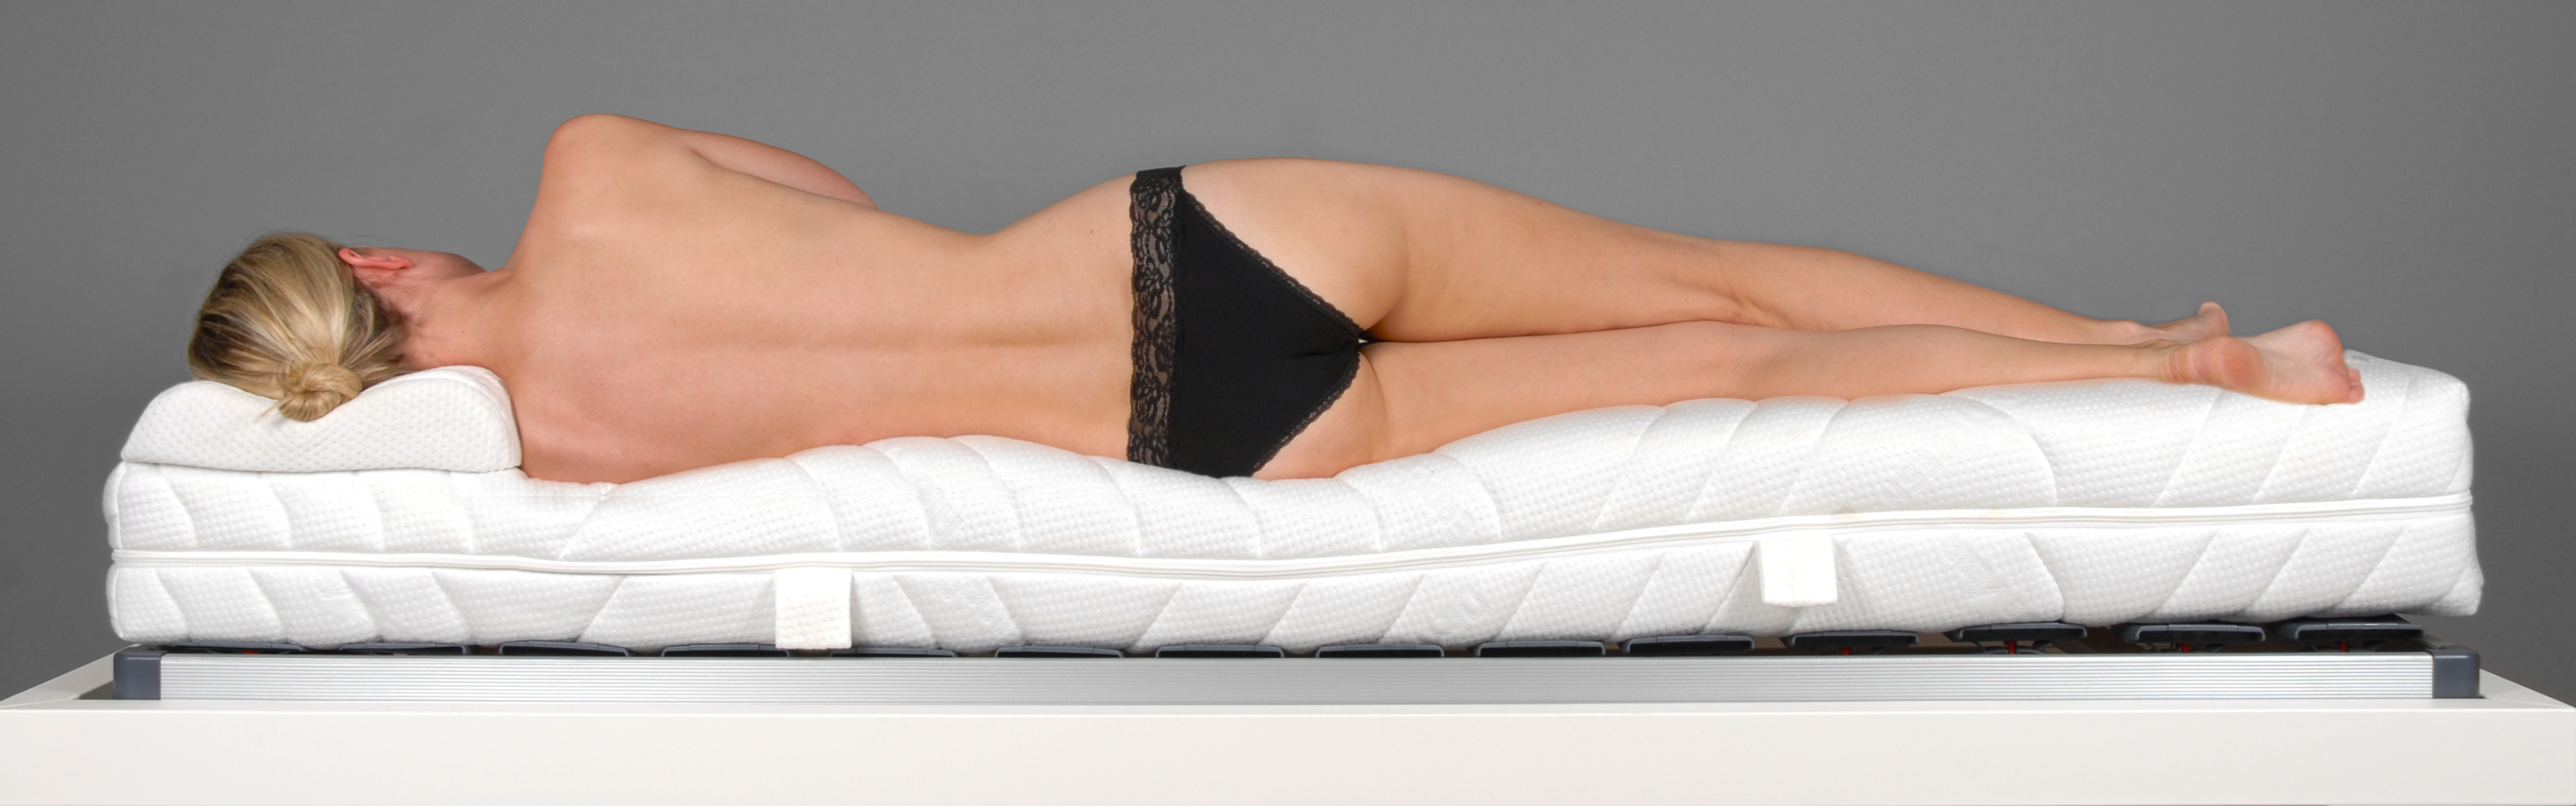 kaufen neu magnetfeld therapie theramag profi. Black Bedroom Furniture Sets. Home Design Ideas